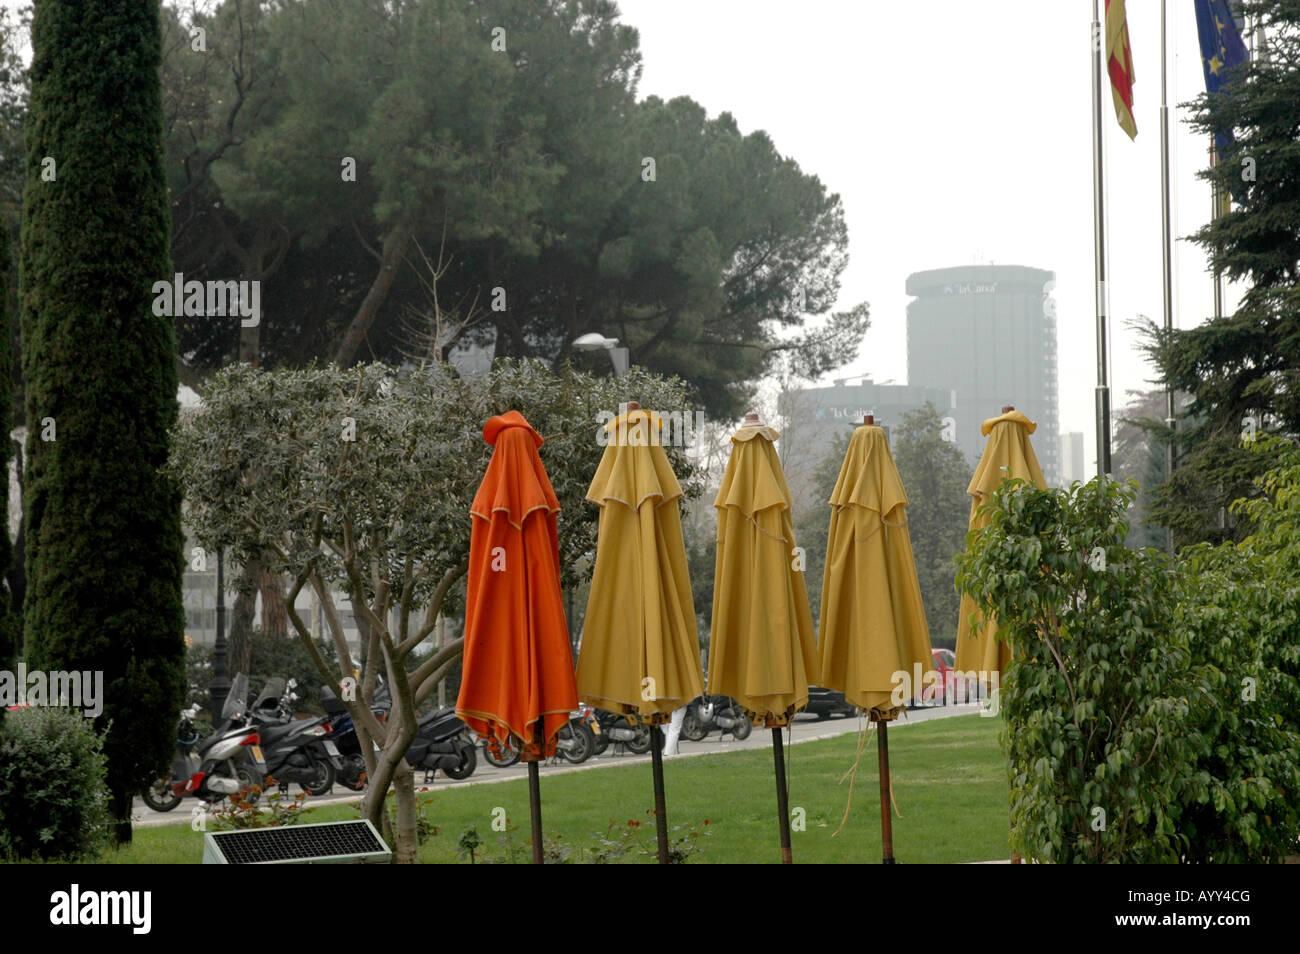 Stadt city town urban Sonnenschirme sunshades parasols Stock Photo